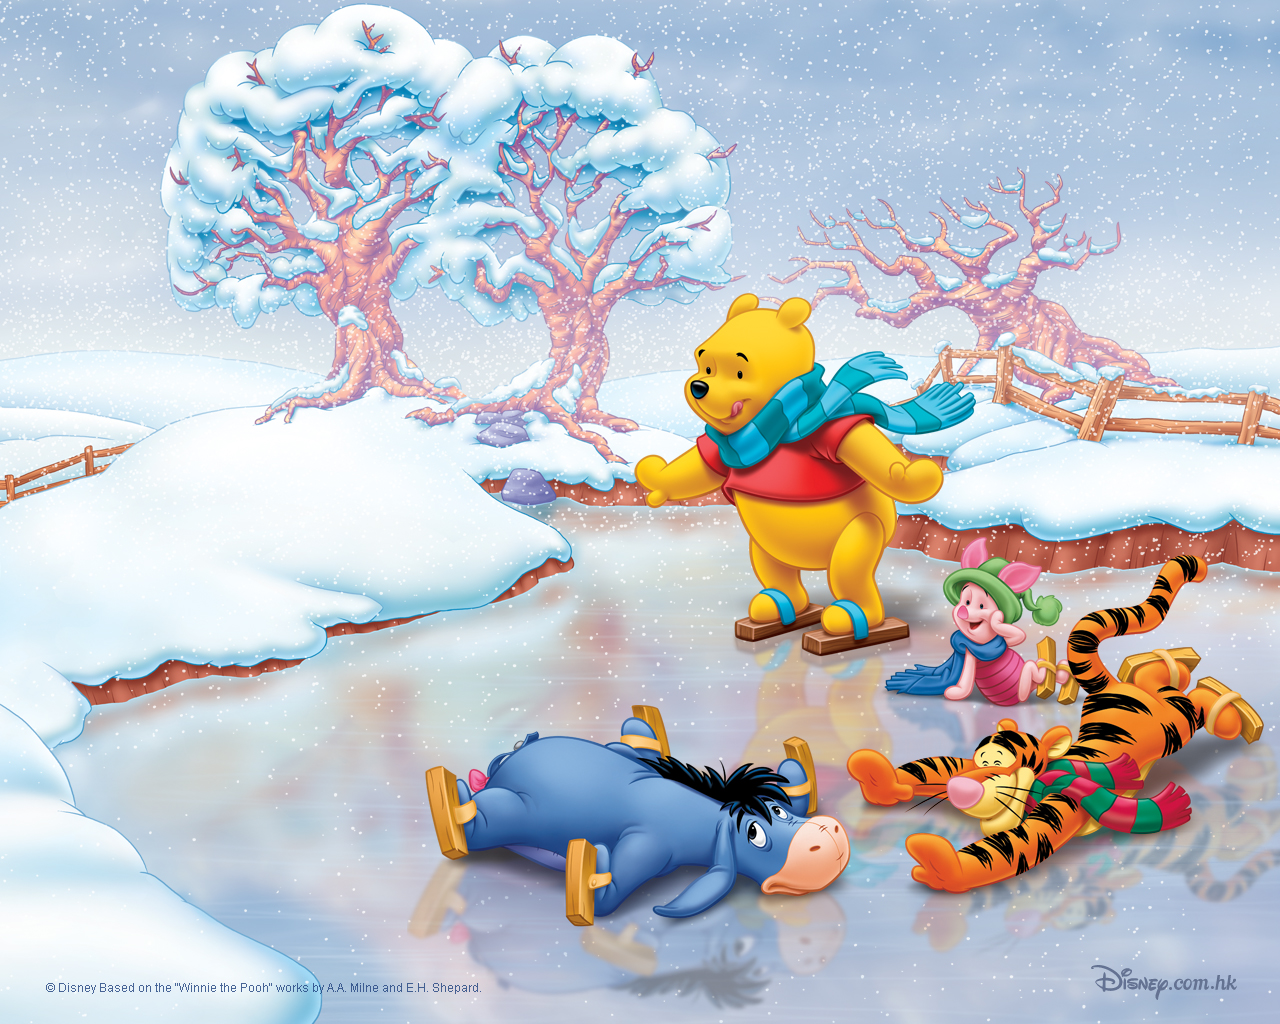 http://4.bp.blogspot.com/_XWP1TEOy898/TRyPcN-xjWI/AAAAAAAAAGI/gJVZLD-J5H0/s1600/Winnie-de-poo-en-Navidad-978277.jpeg